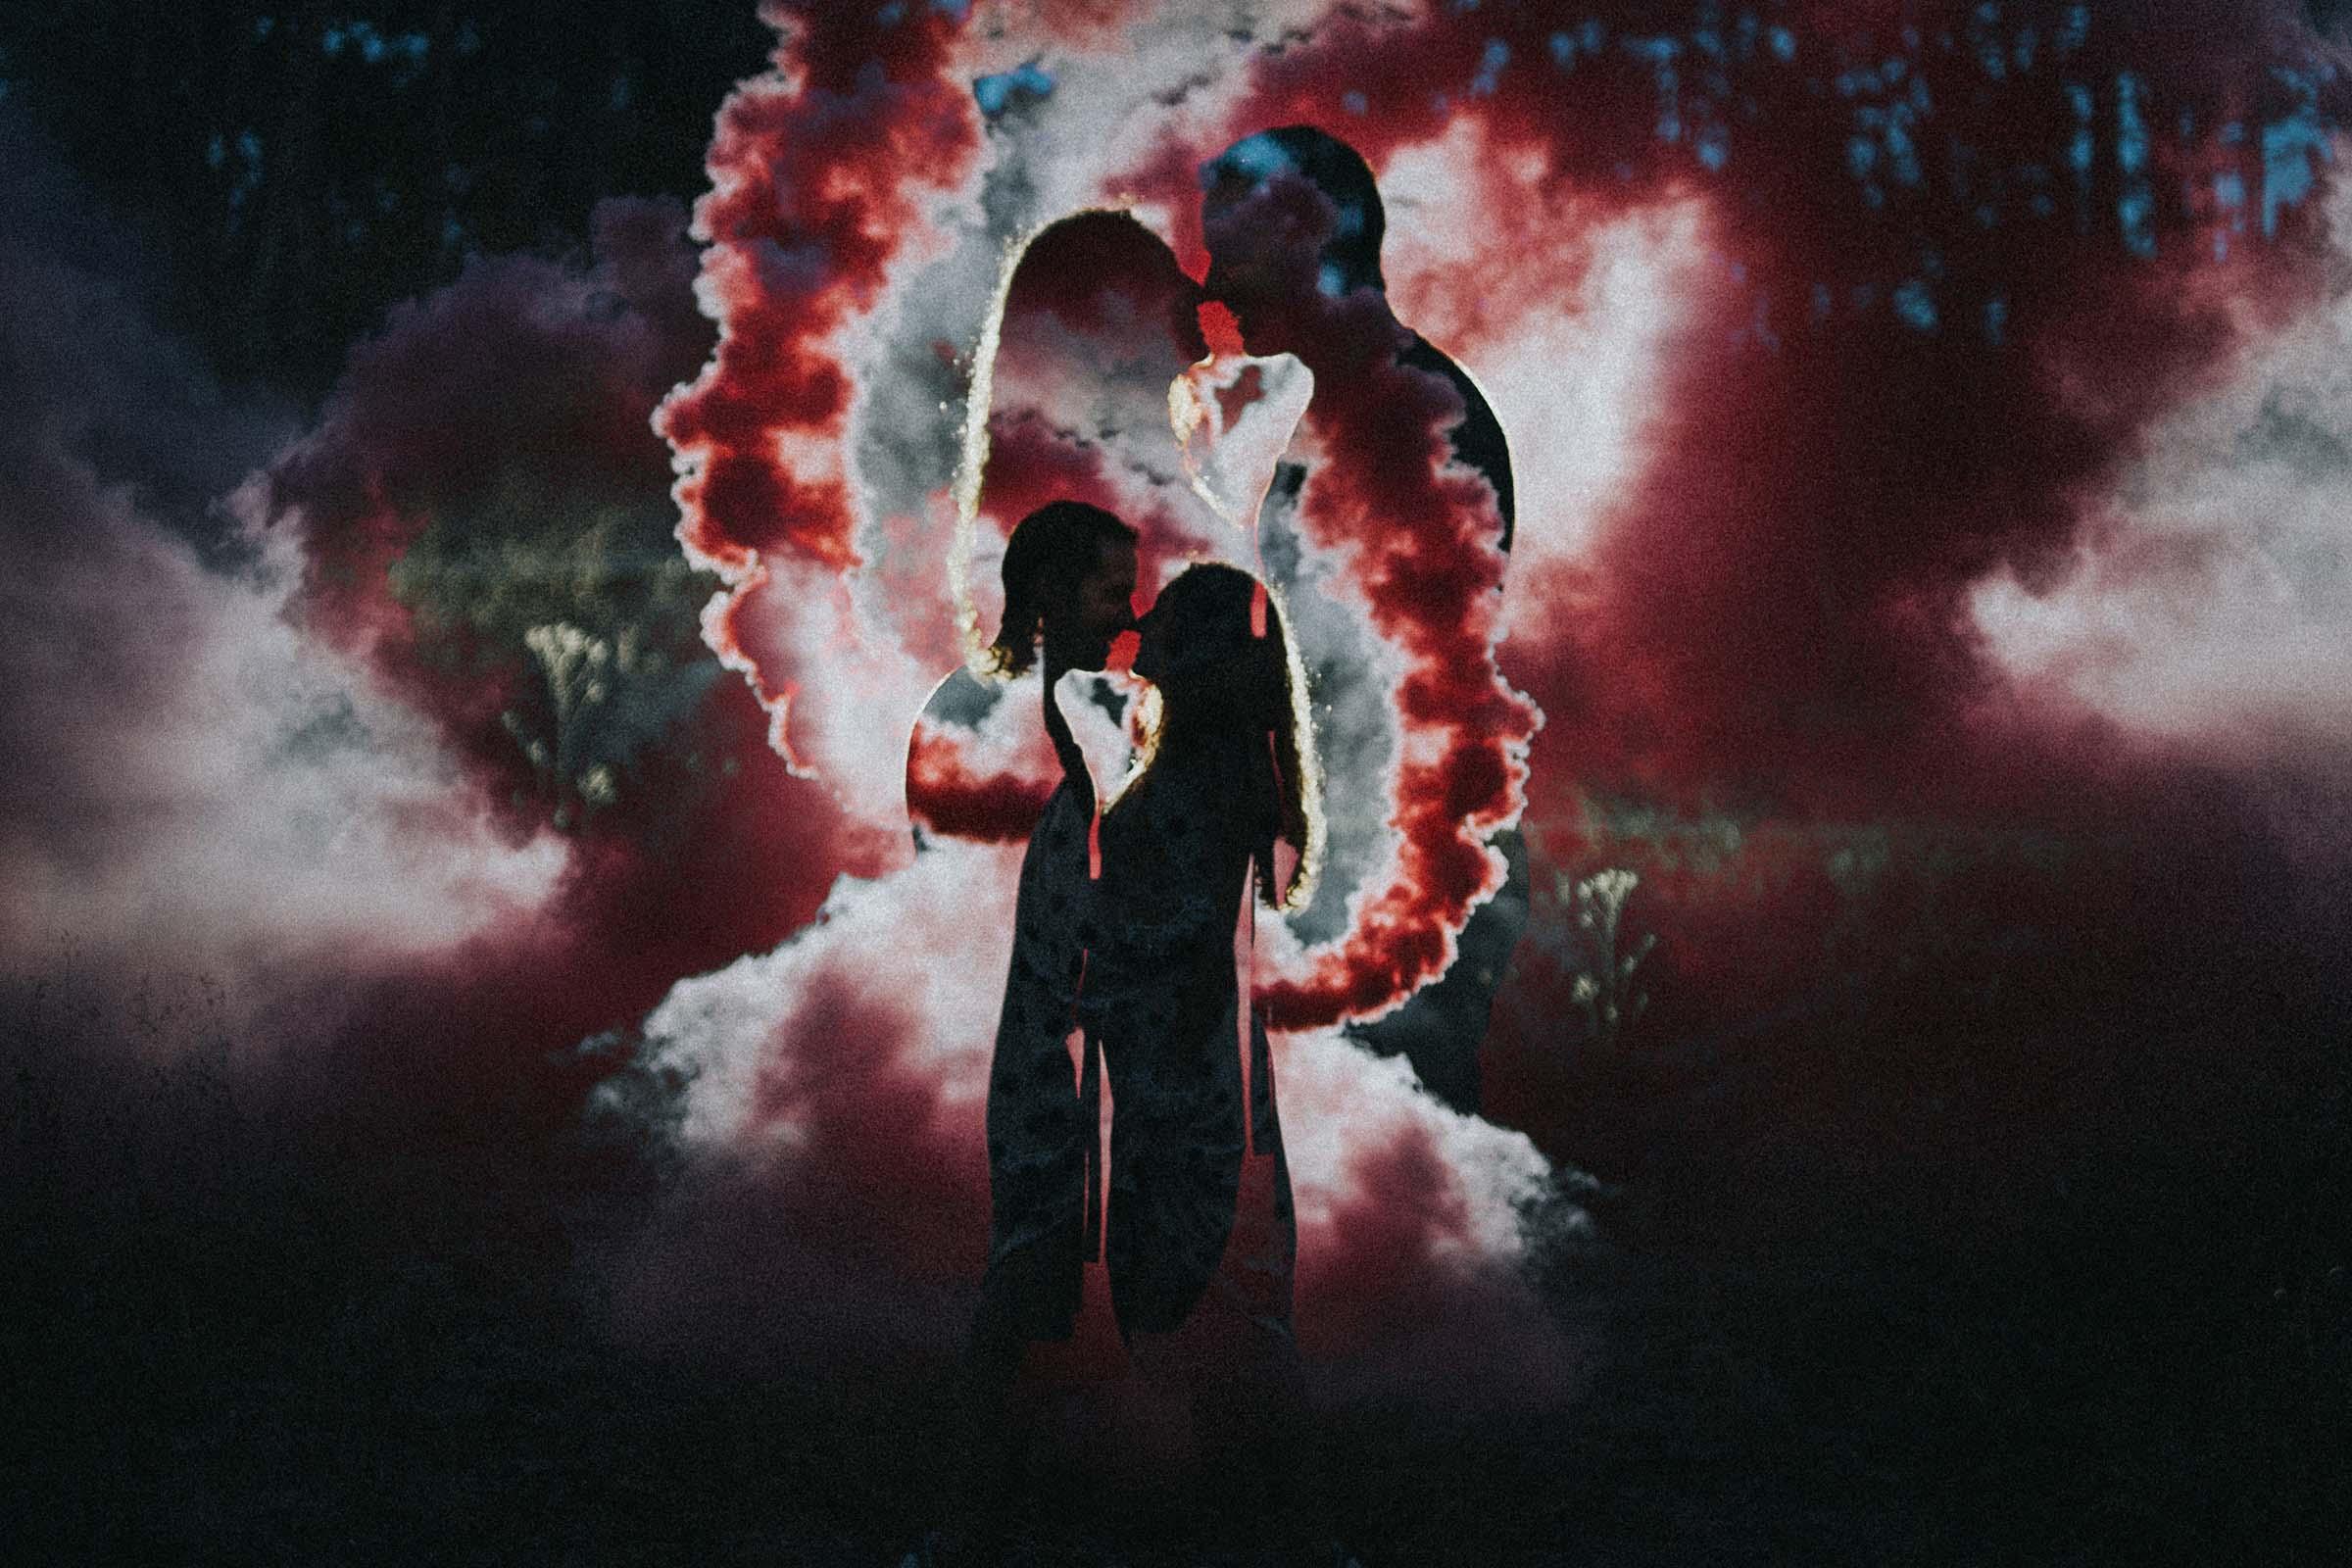 double exposure photography with smoke bombs